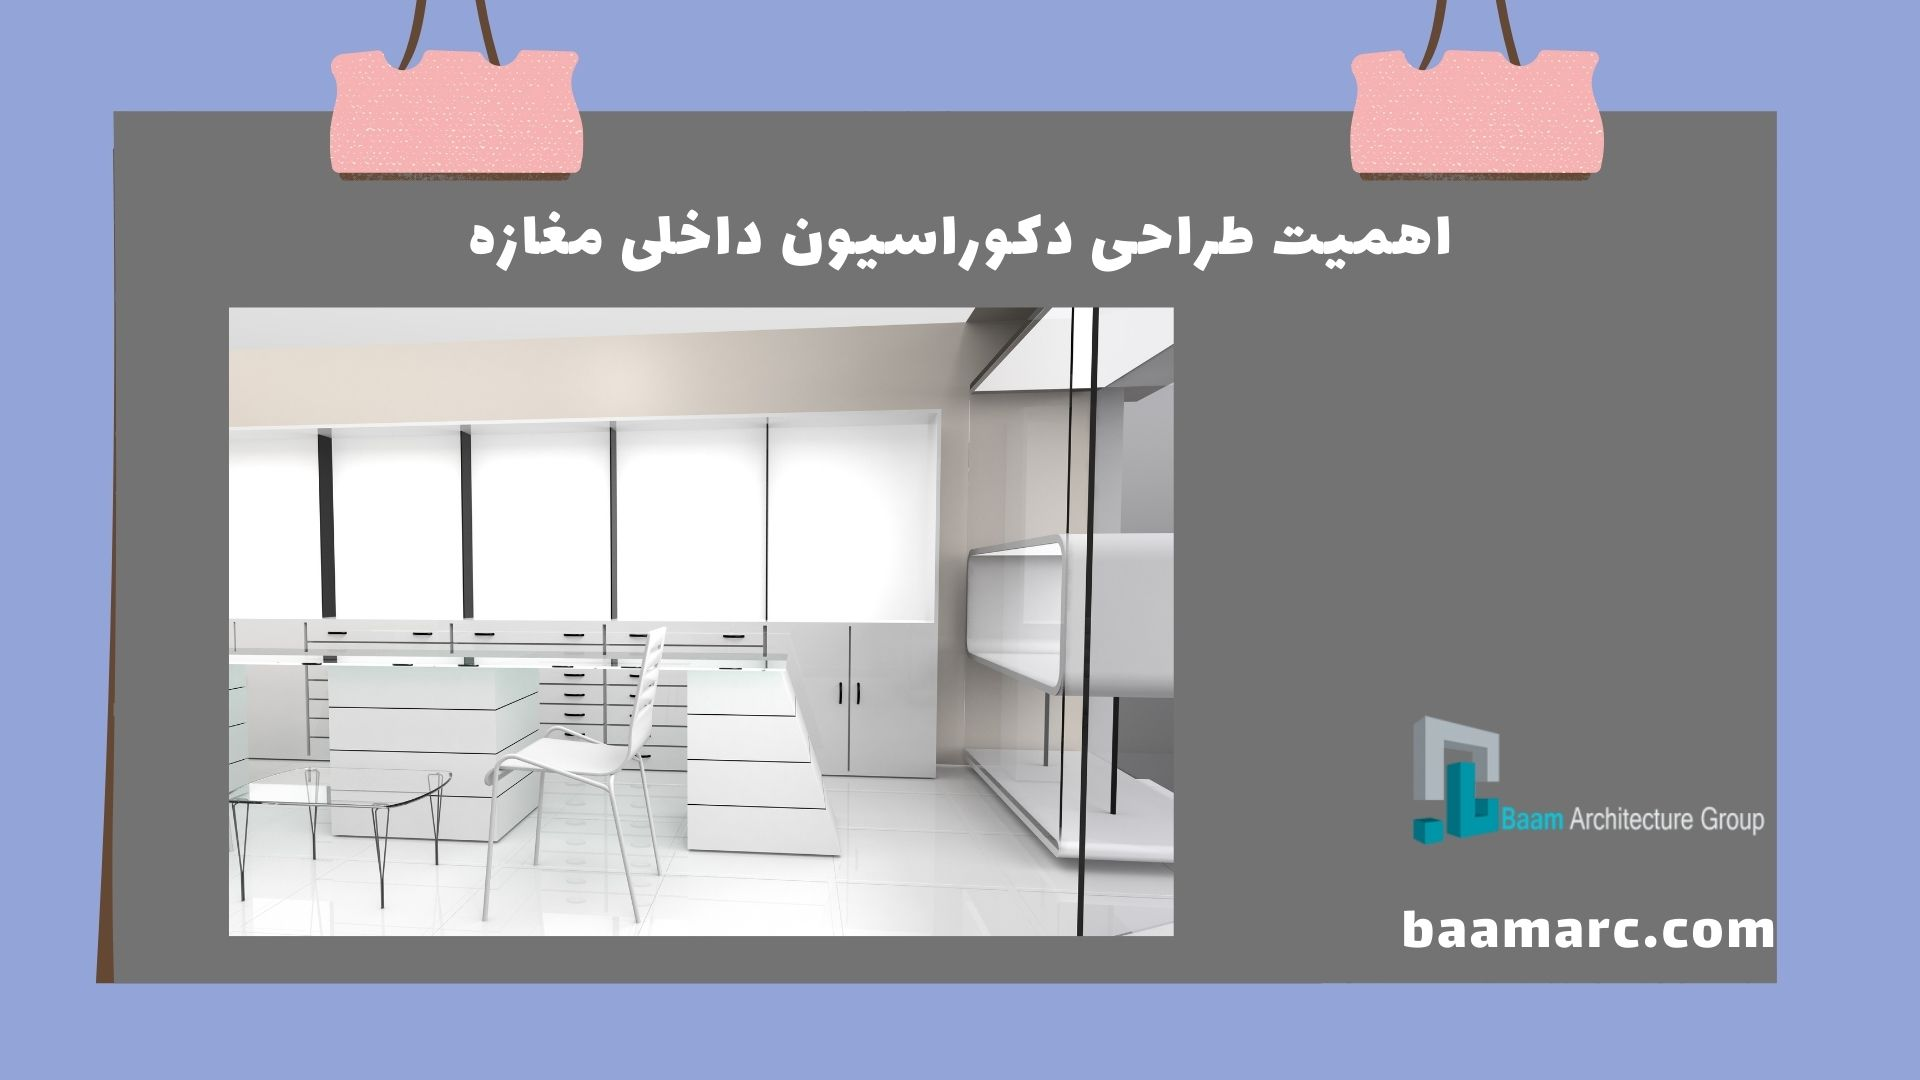 اهمیت طراحی دکوراسیون داخلی مغازه